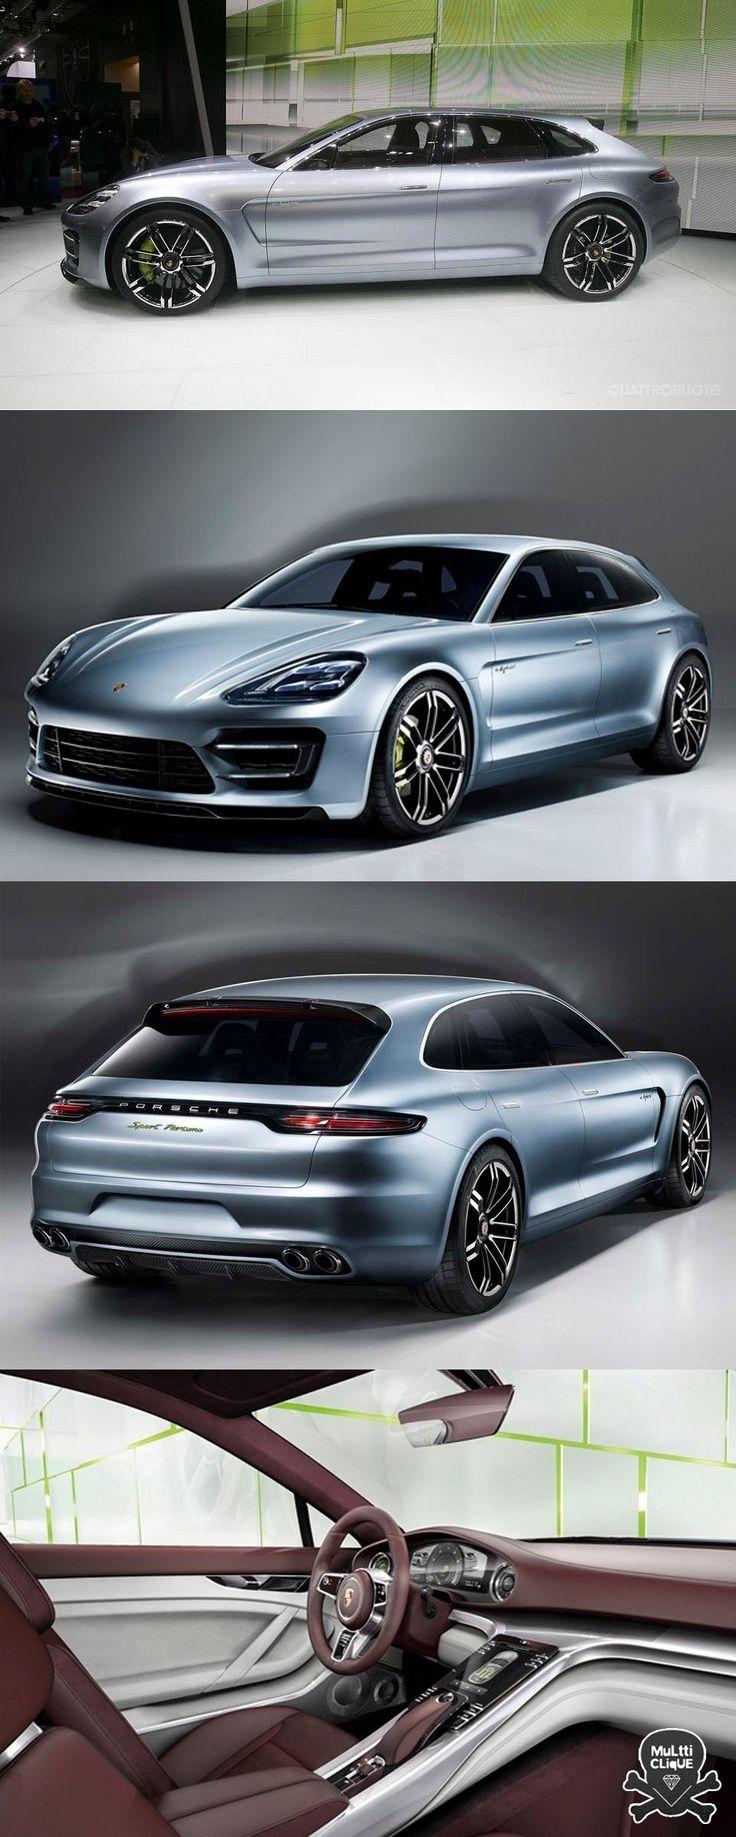 Best Dubai Luxury And Sports Cars In Dubai Porsche Panamera Esporte